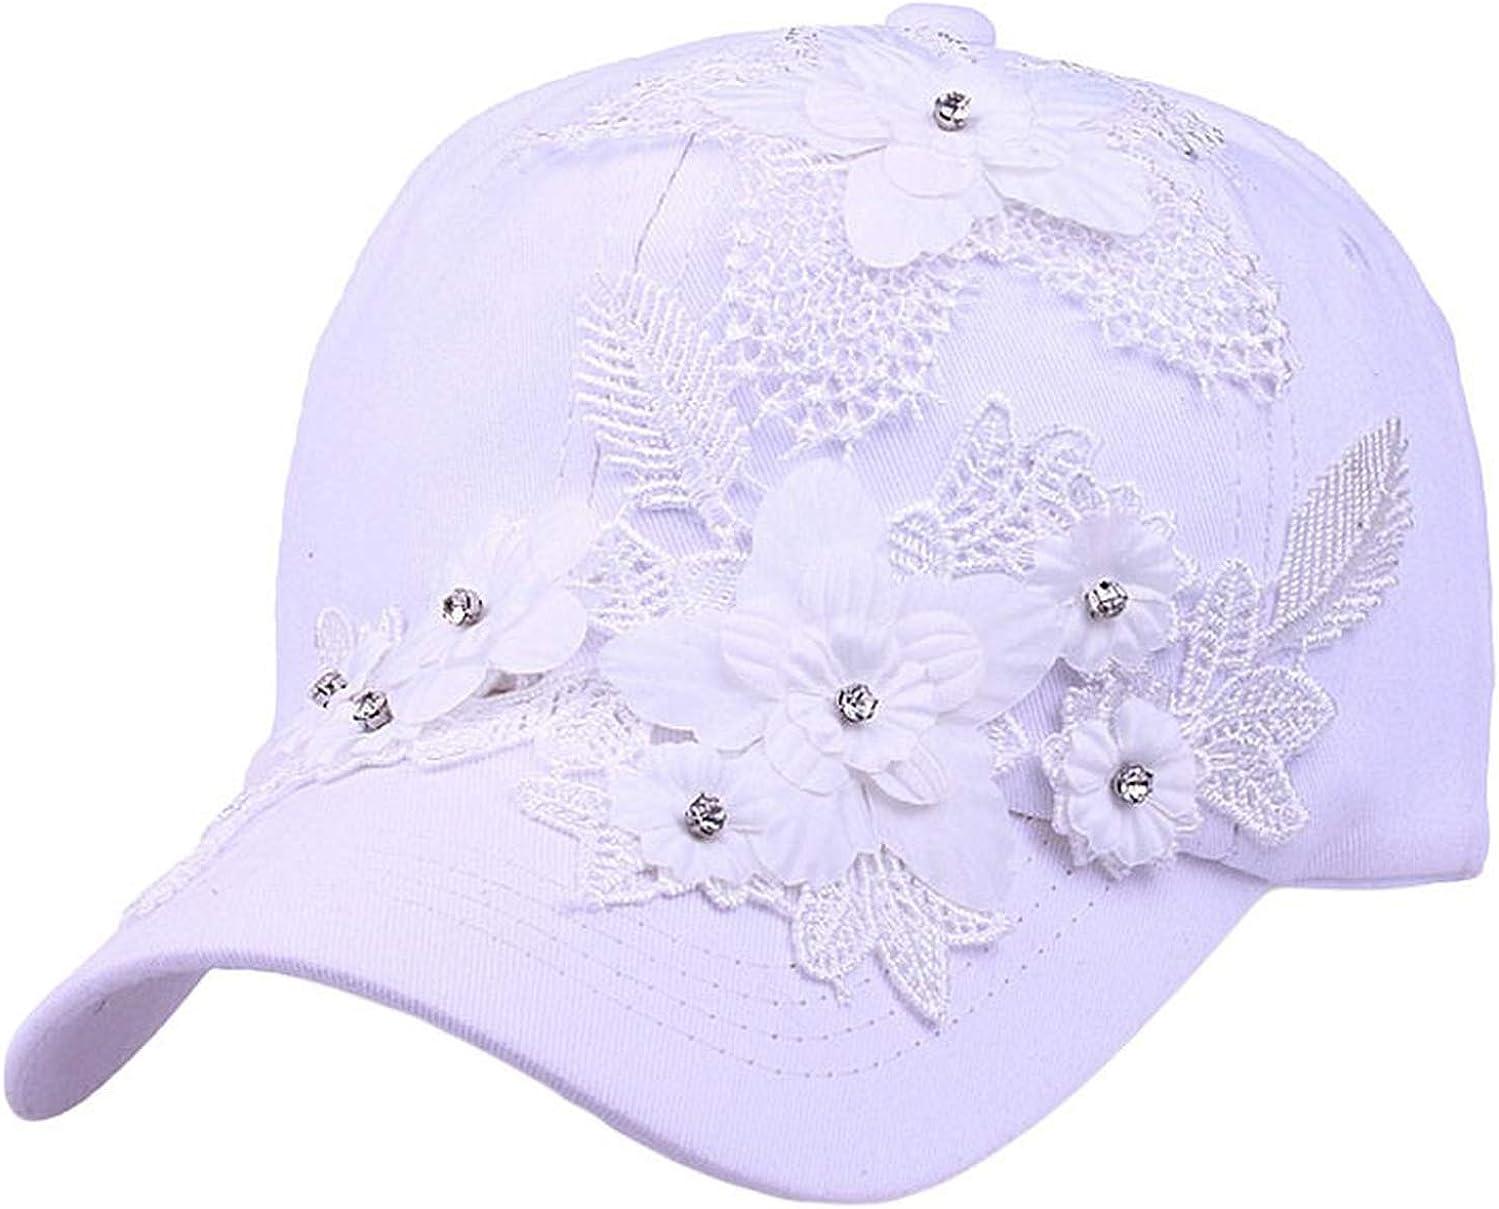 Womens Flower with Lace Denim Baseball Cap Adjustable Rhinestone Solid Cap Outdoor Sports Vintage Sun hat